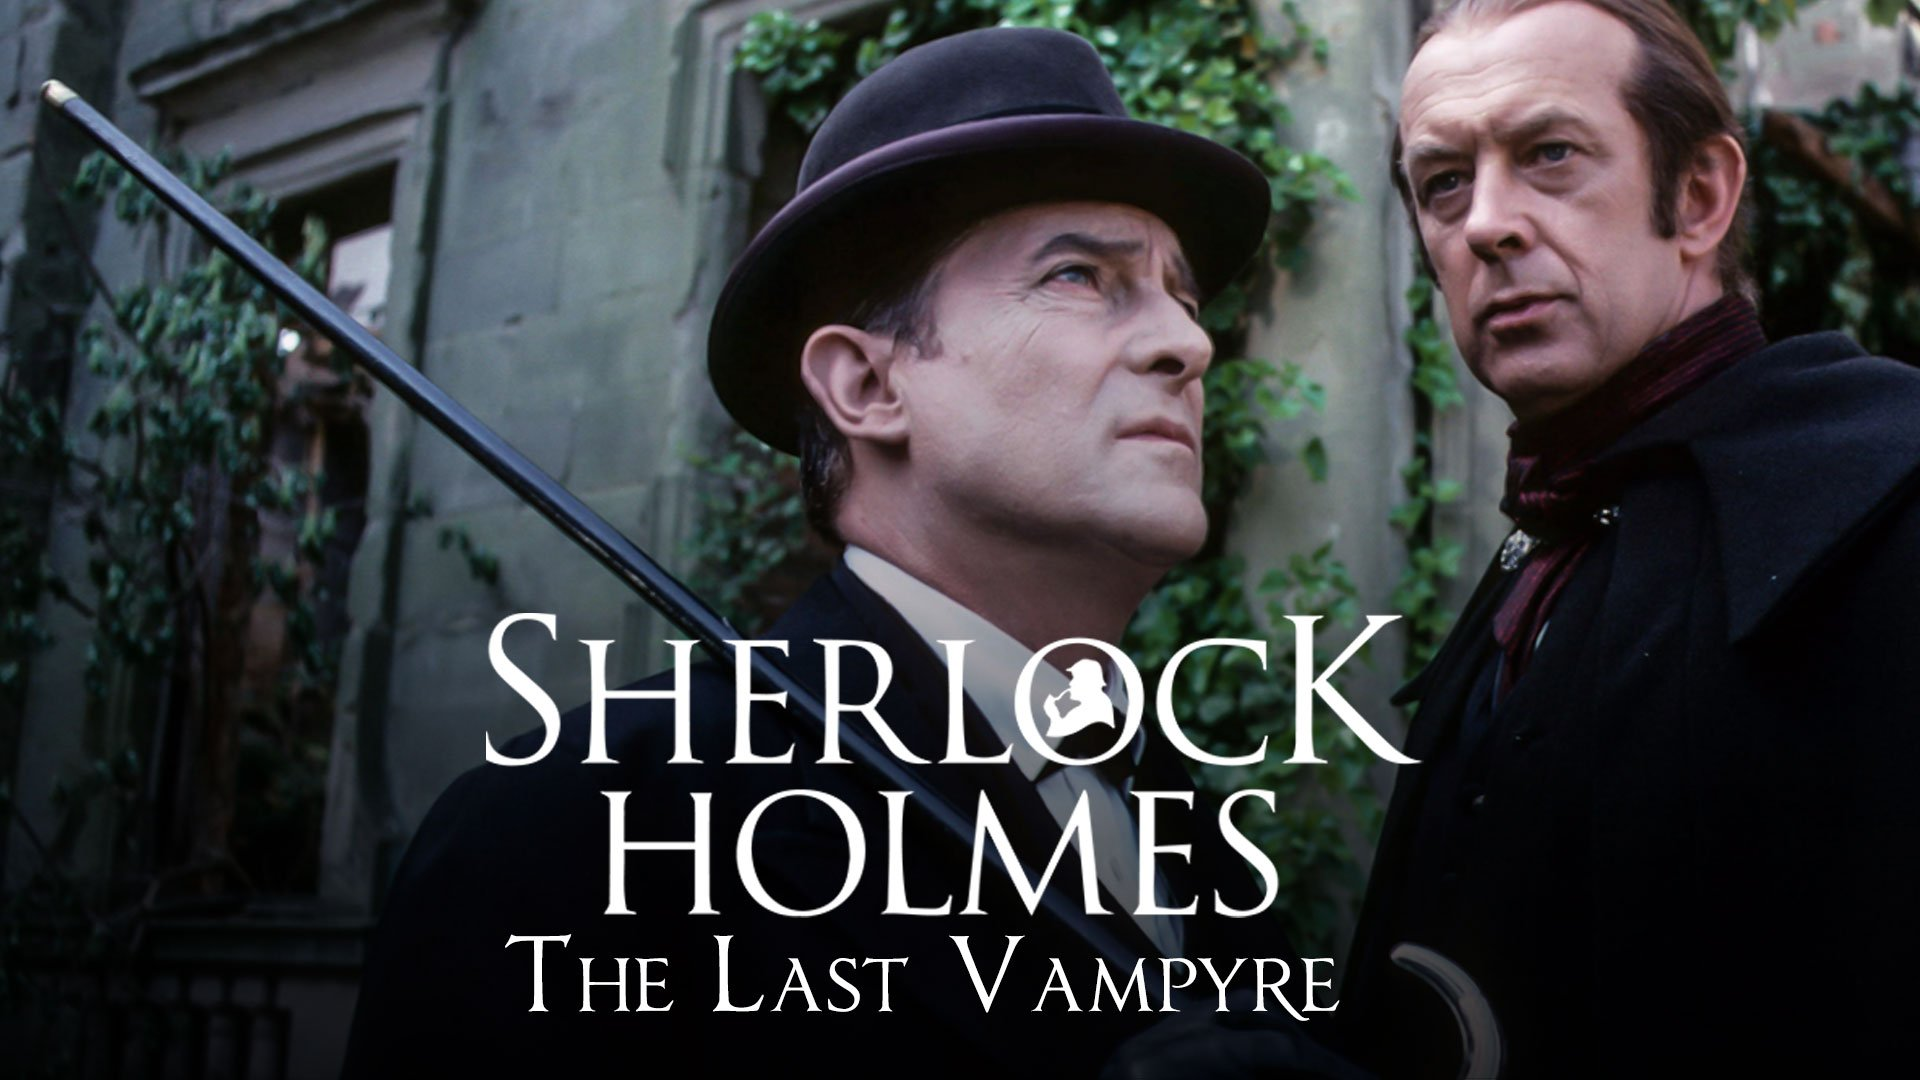 Sherlock Holmes: The Last Vampyre on BritBox UK